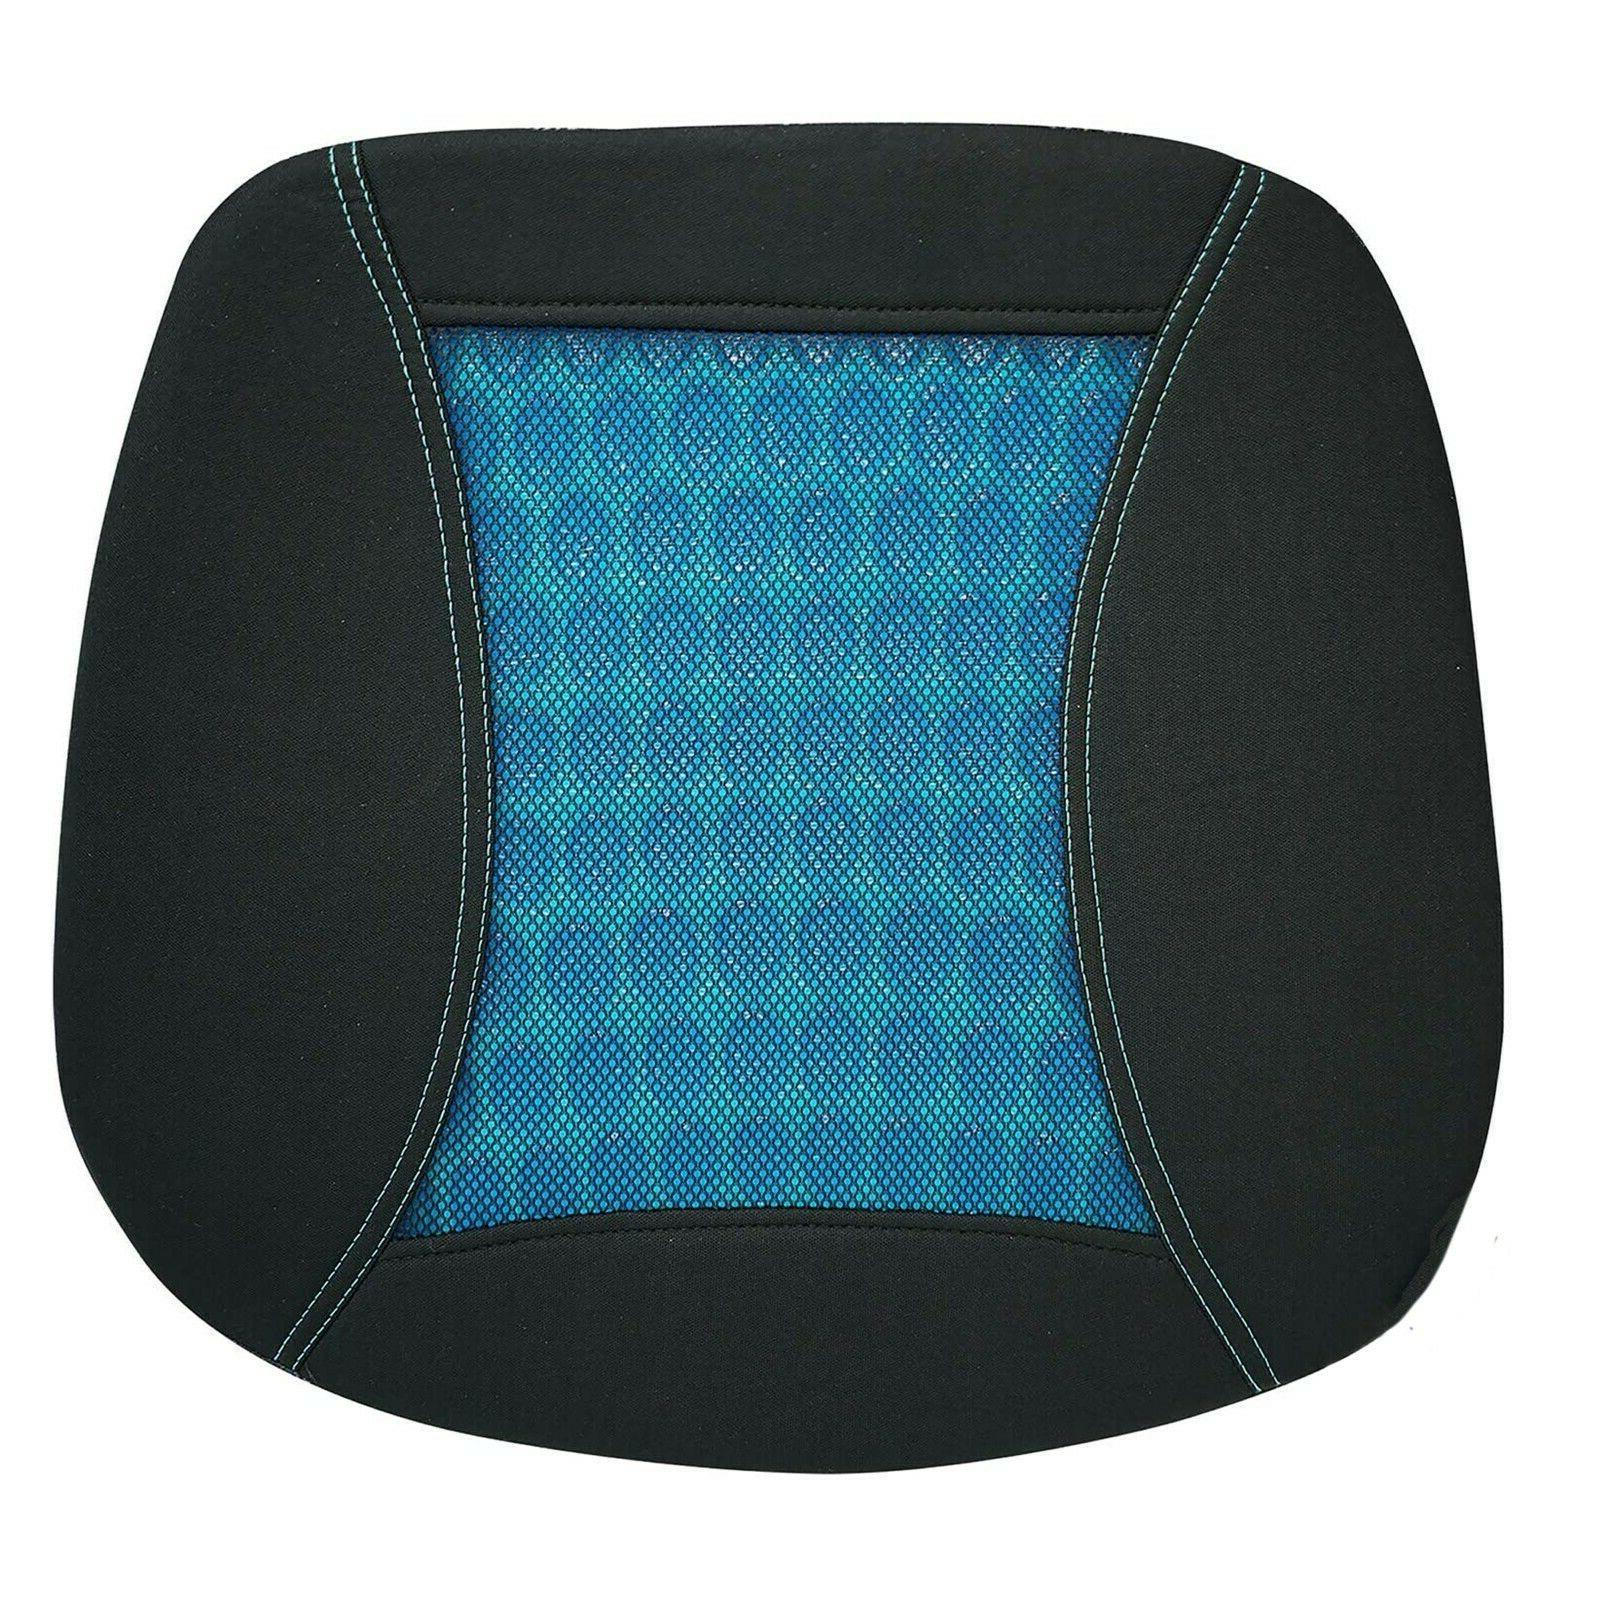 orthopedic gel and memory foam seat cushion